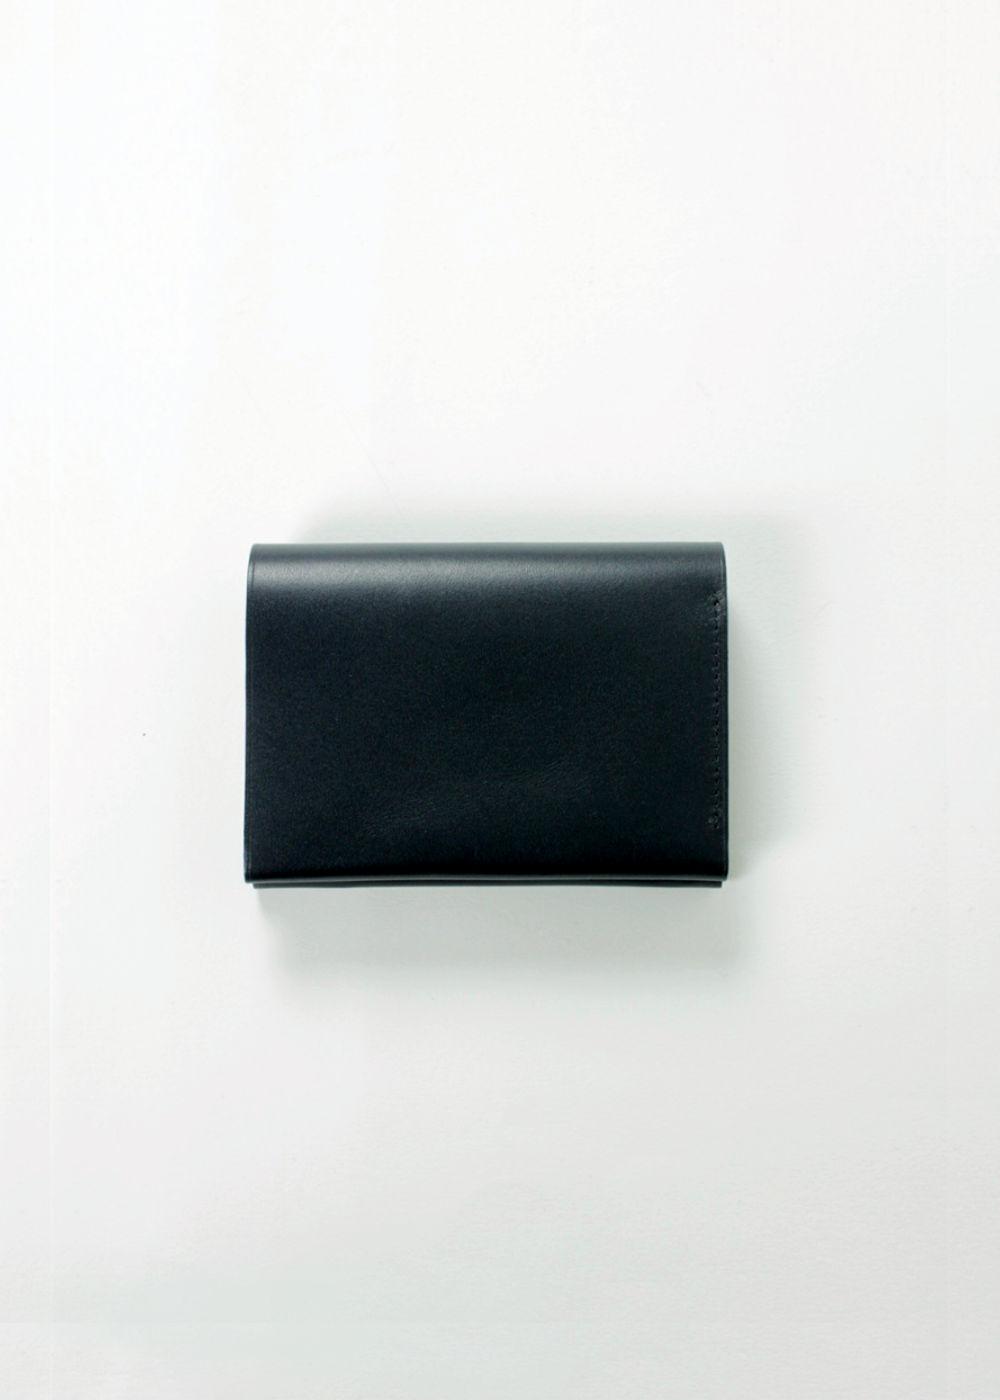 Postalco-Pressed-Cotton-Card-&-Coin-Wallet-NavyBlue-01